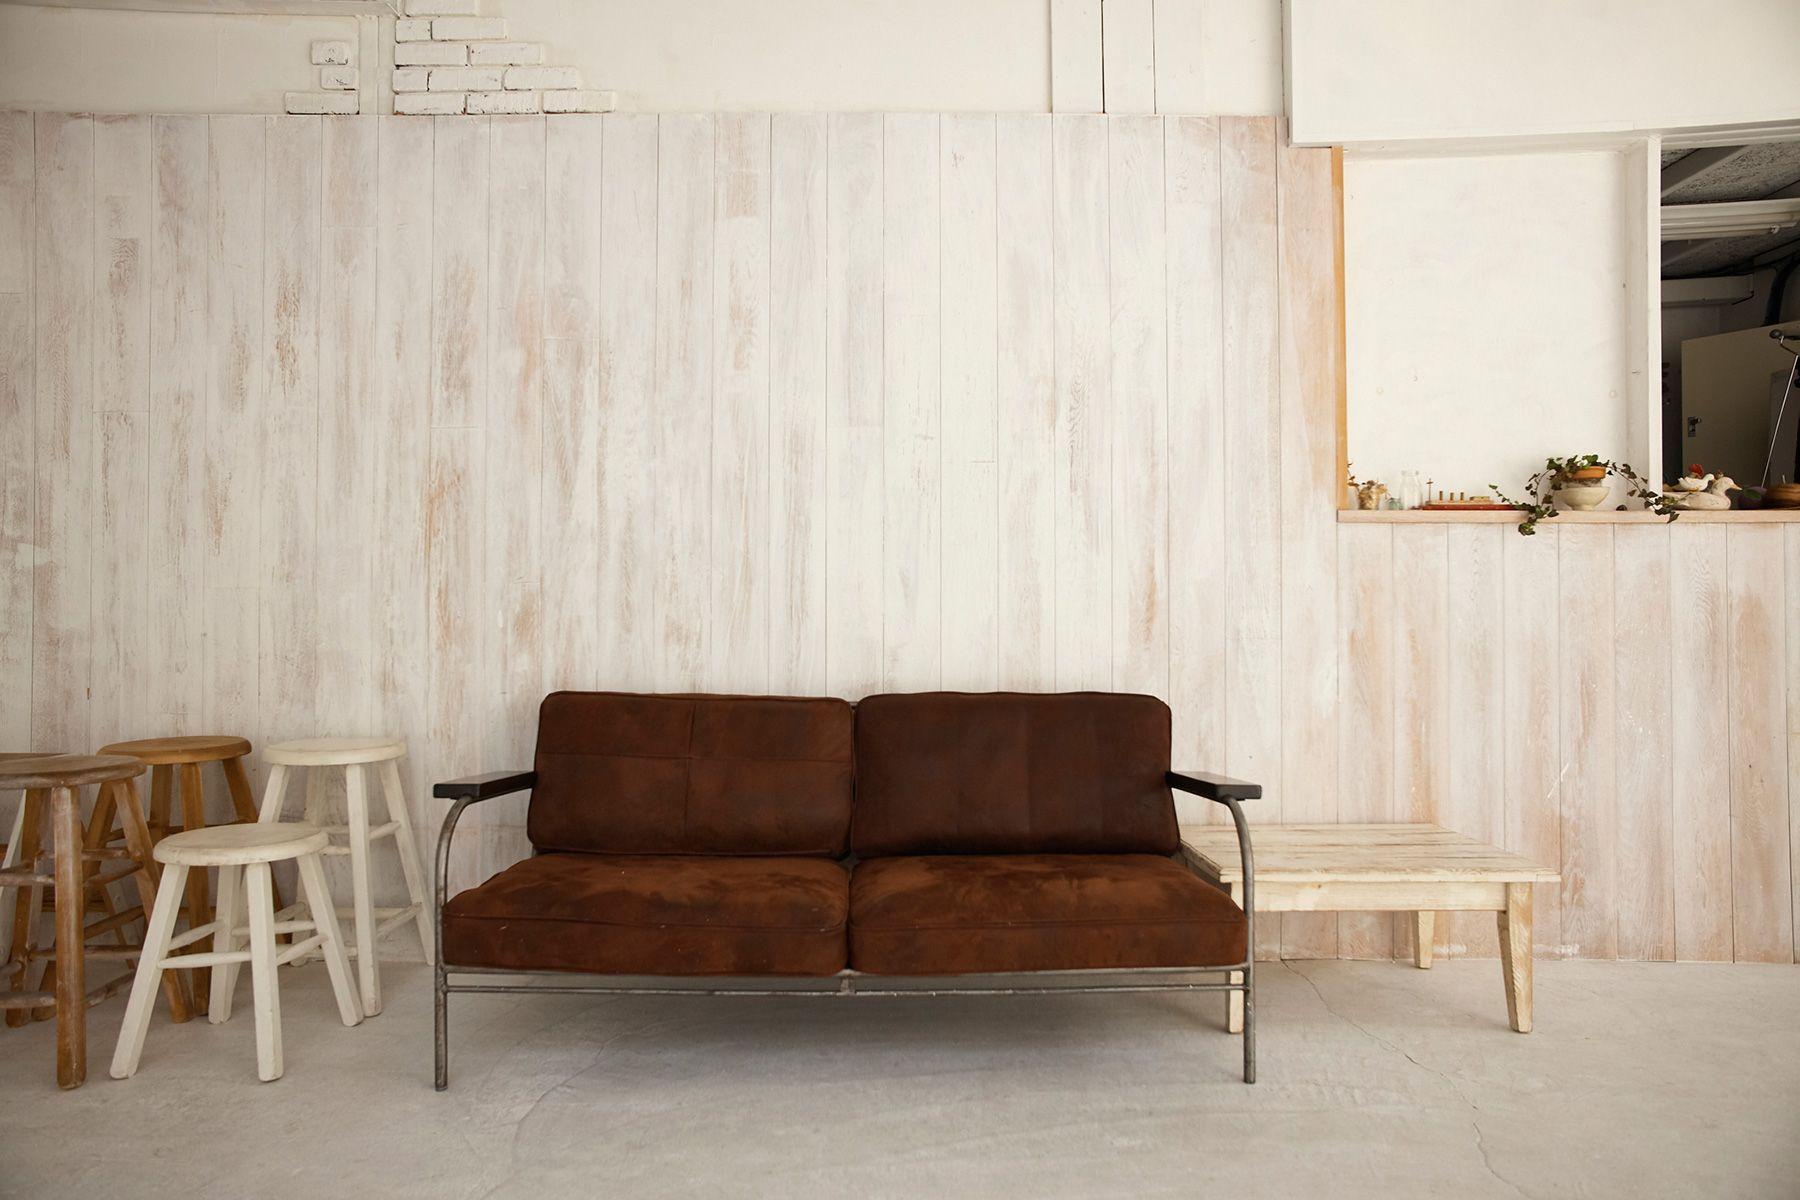 STUDIO MAU(スタジオ マウ)やわらかな木の壁